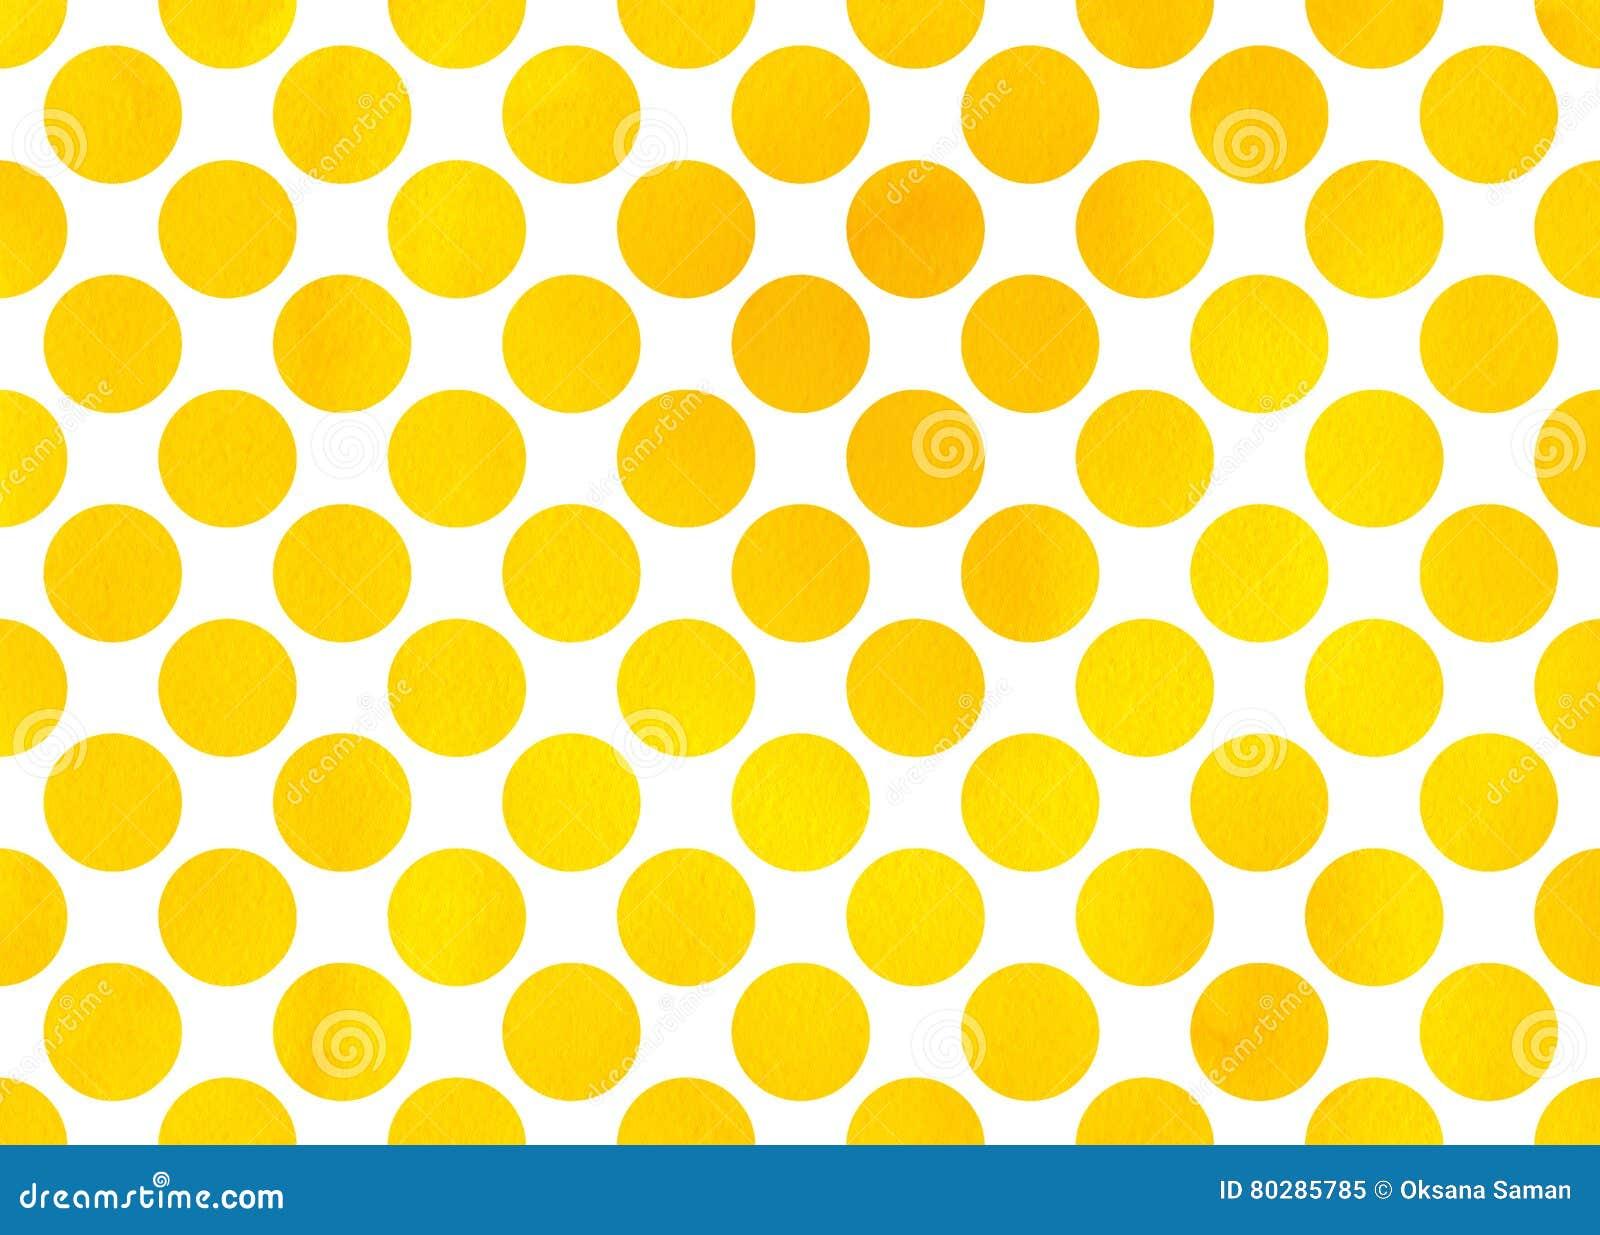 5f6e87a56c4 Watercolor Polka Dot Background. Stock Illustration - Illustration ...